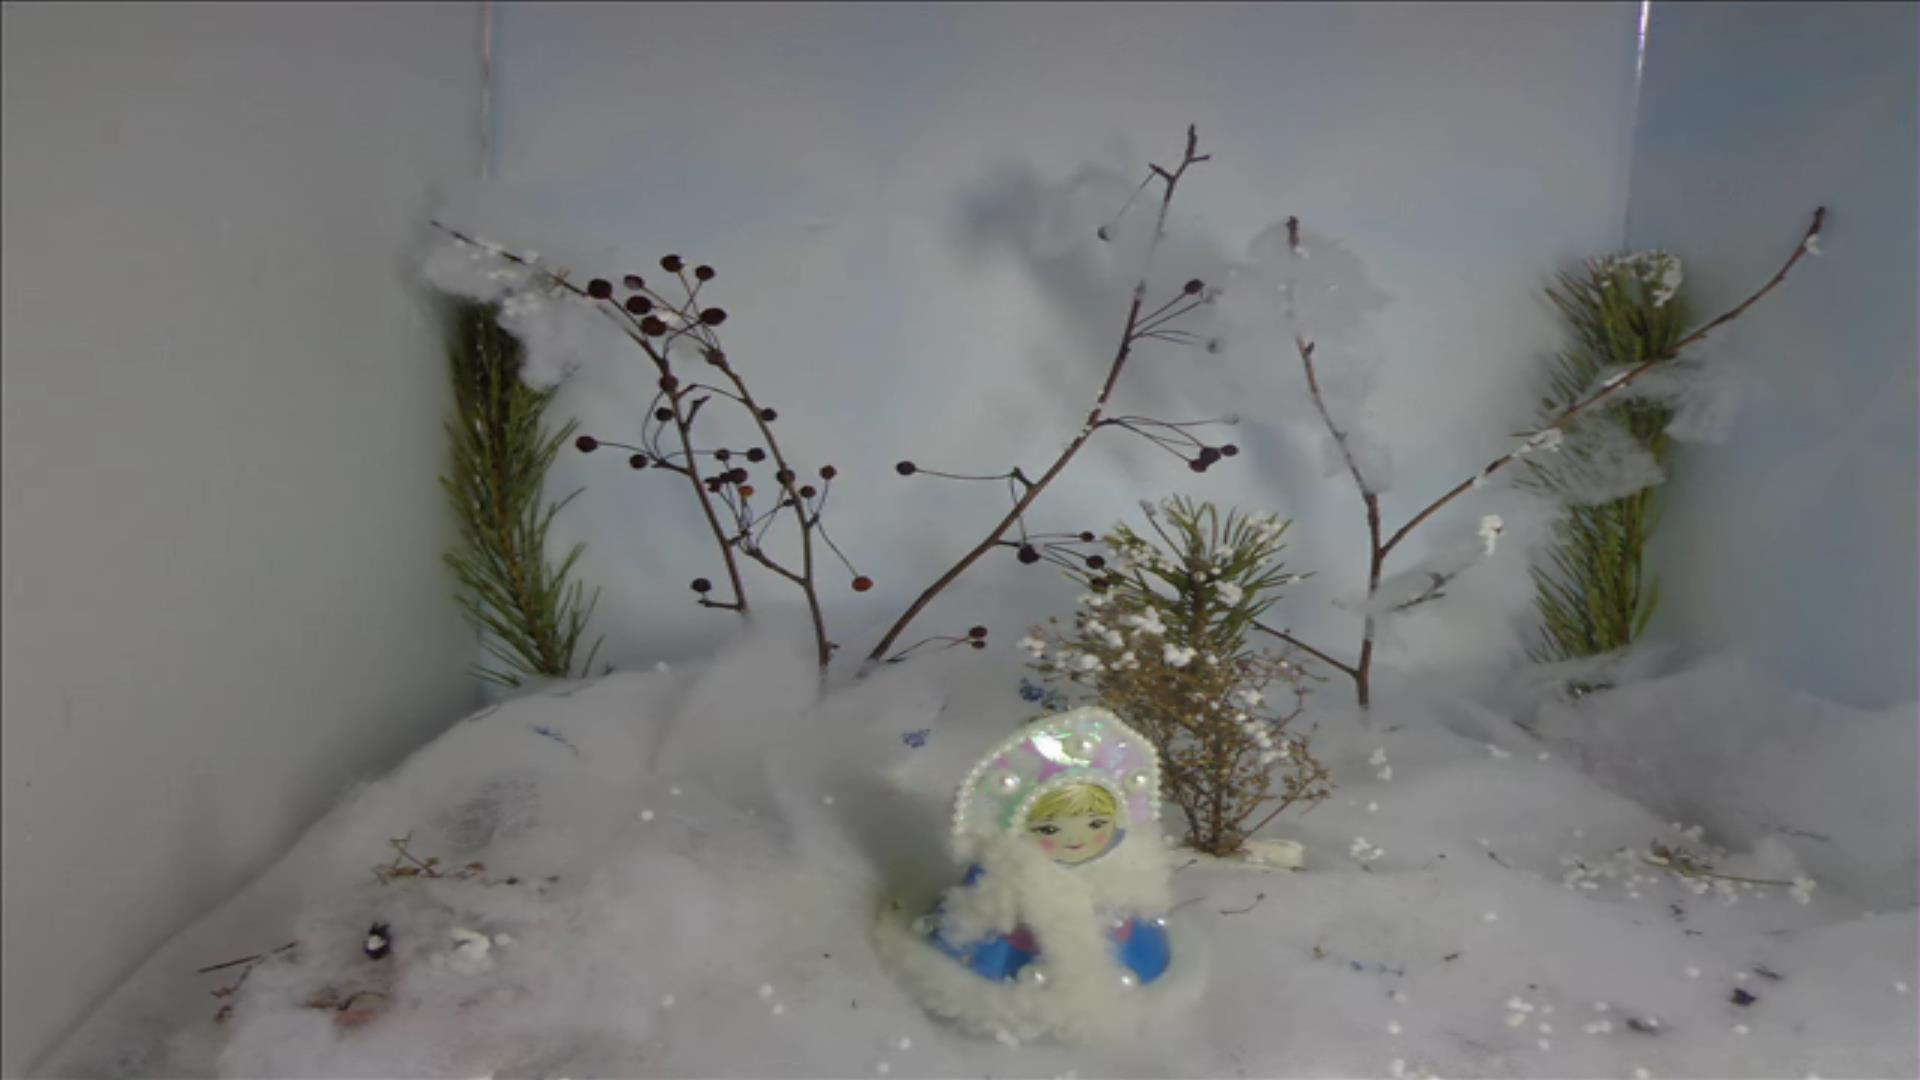 C:\Users\admin\Desktop\ЗАХВАТ\Зима в лесу[18-51-15].JPG